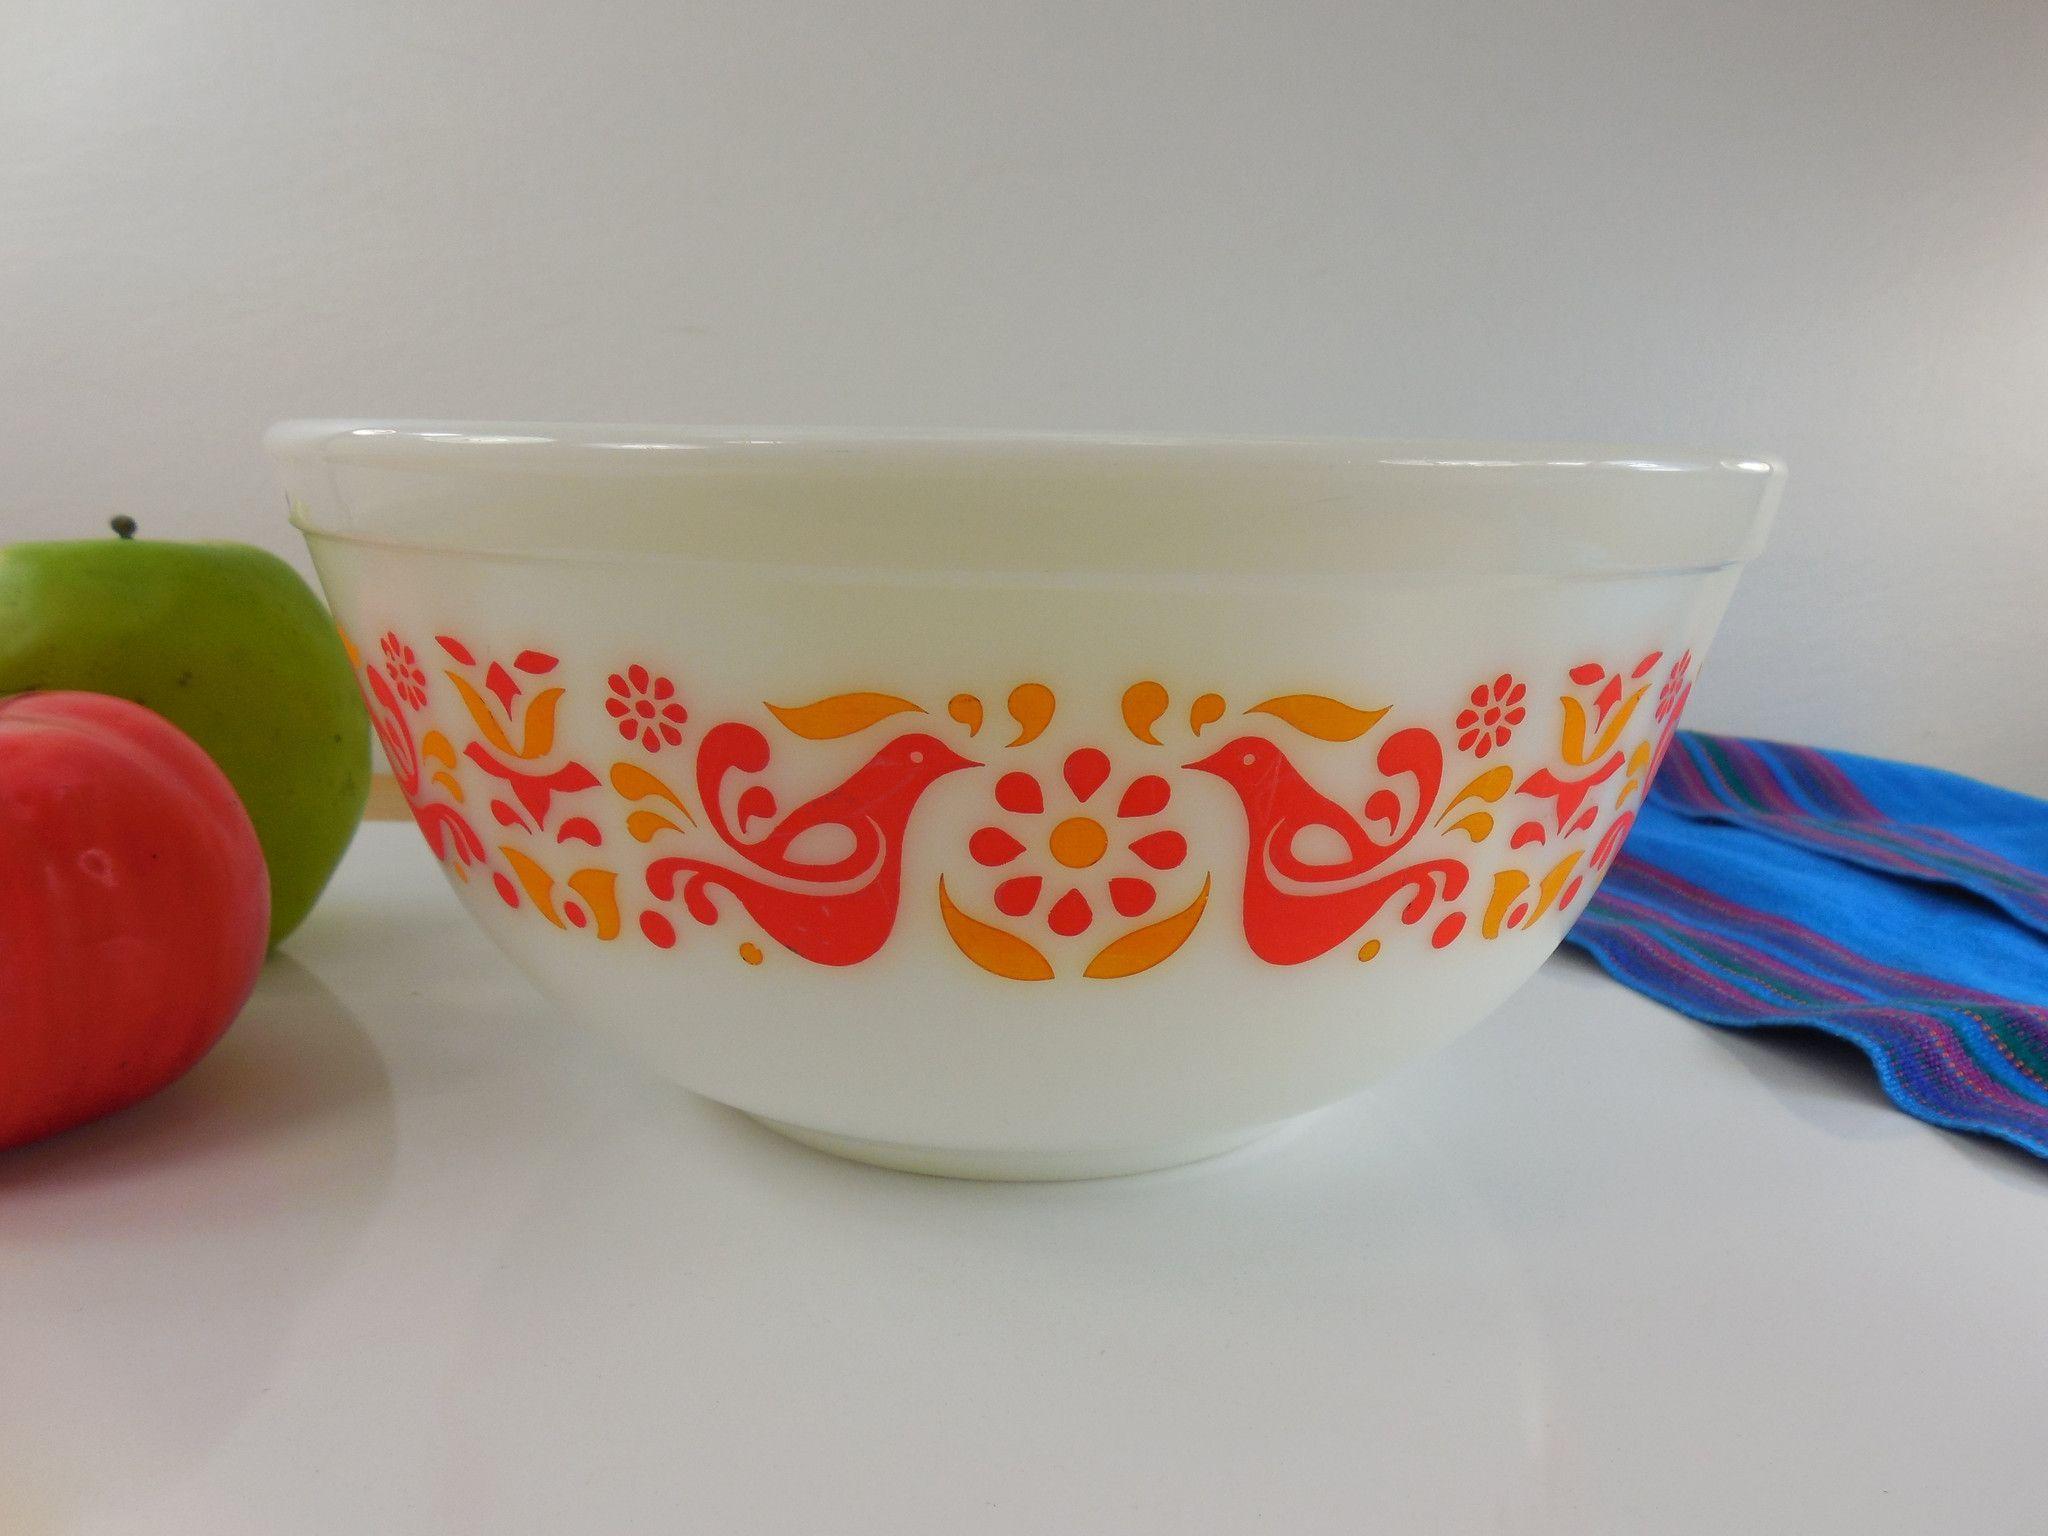 Pyrex Glass Mixing Bowl - Friendship Pattern - 403 2-1/2 Quart ...